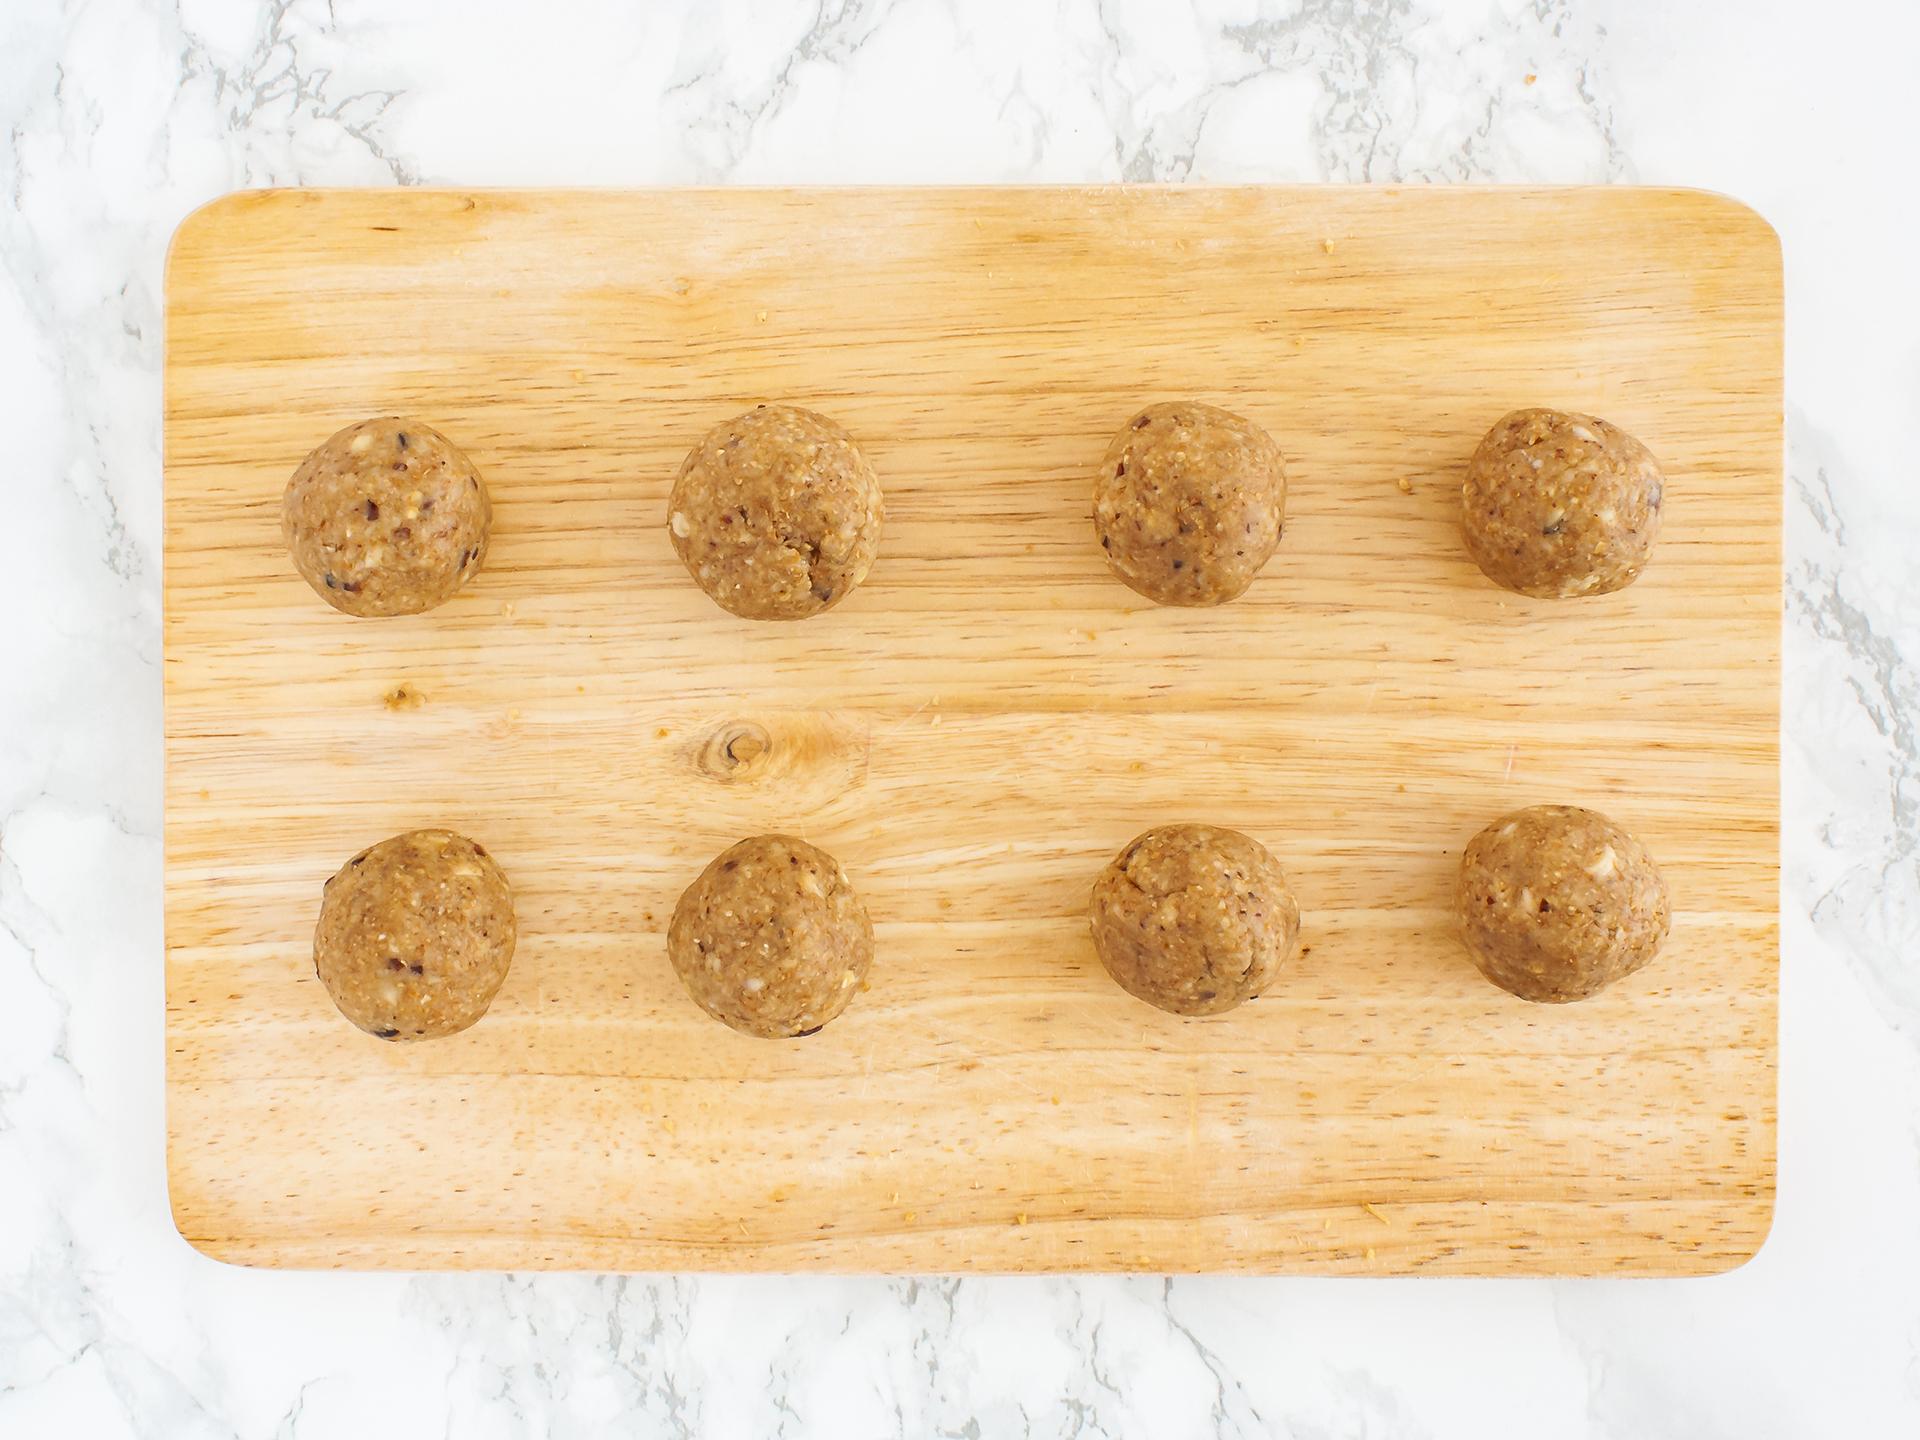 Step 2.2 of Chocolate and Coconut Cashew Truffles Recipe